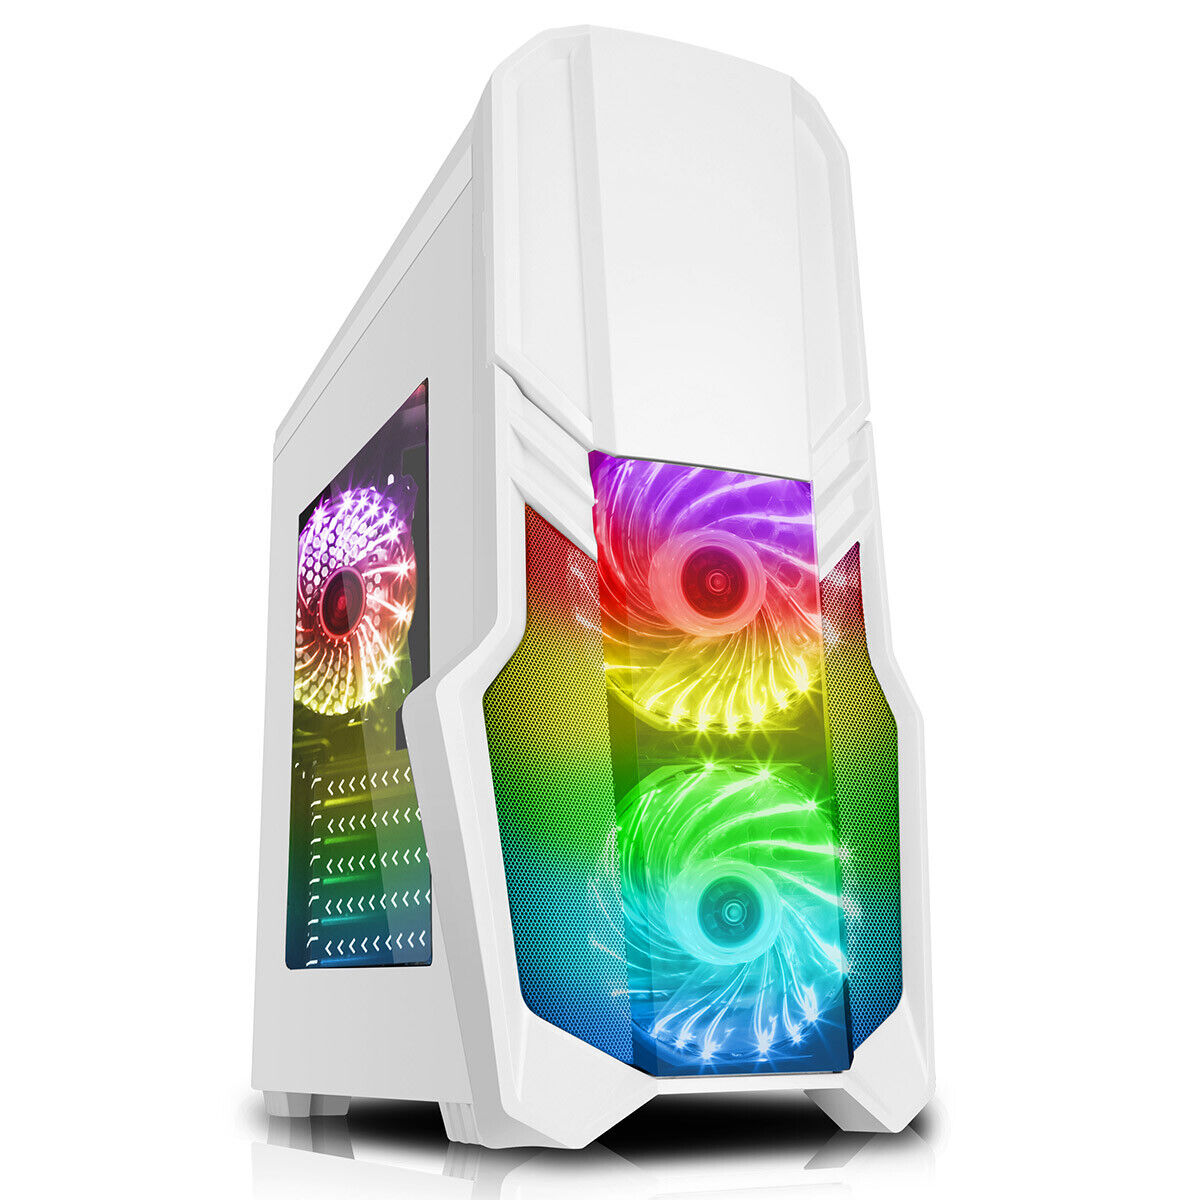 Computer Games - GAMING COMPUTER PC INTEL CORE i3 2100 1TB  Windows 10 8GB RAM 2GB GT710 HDMI